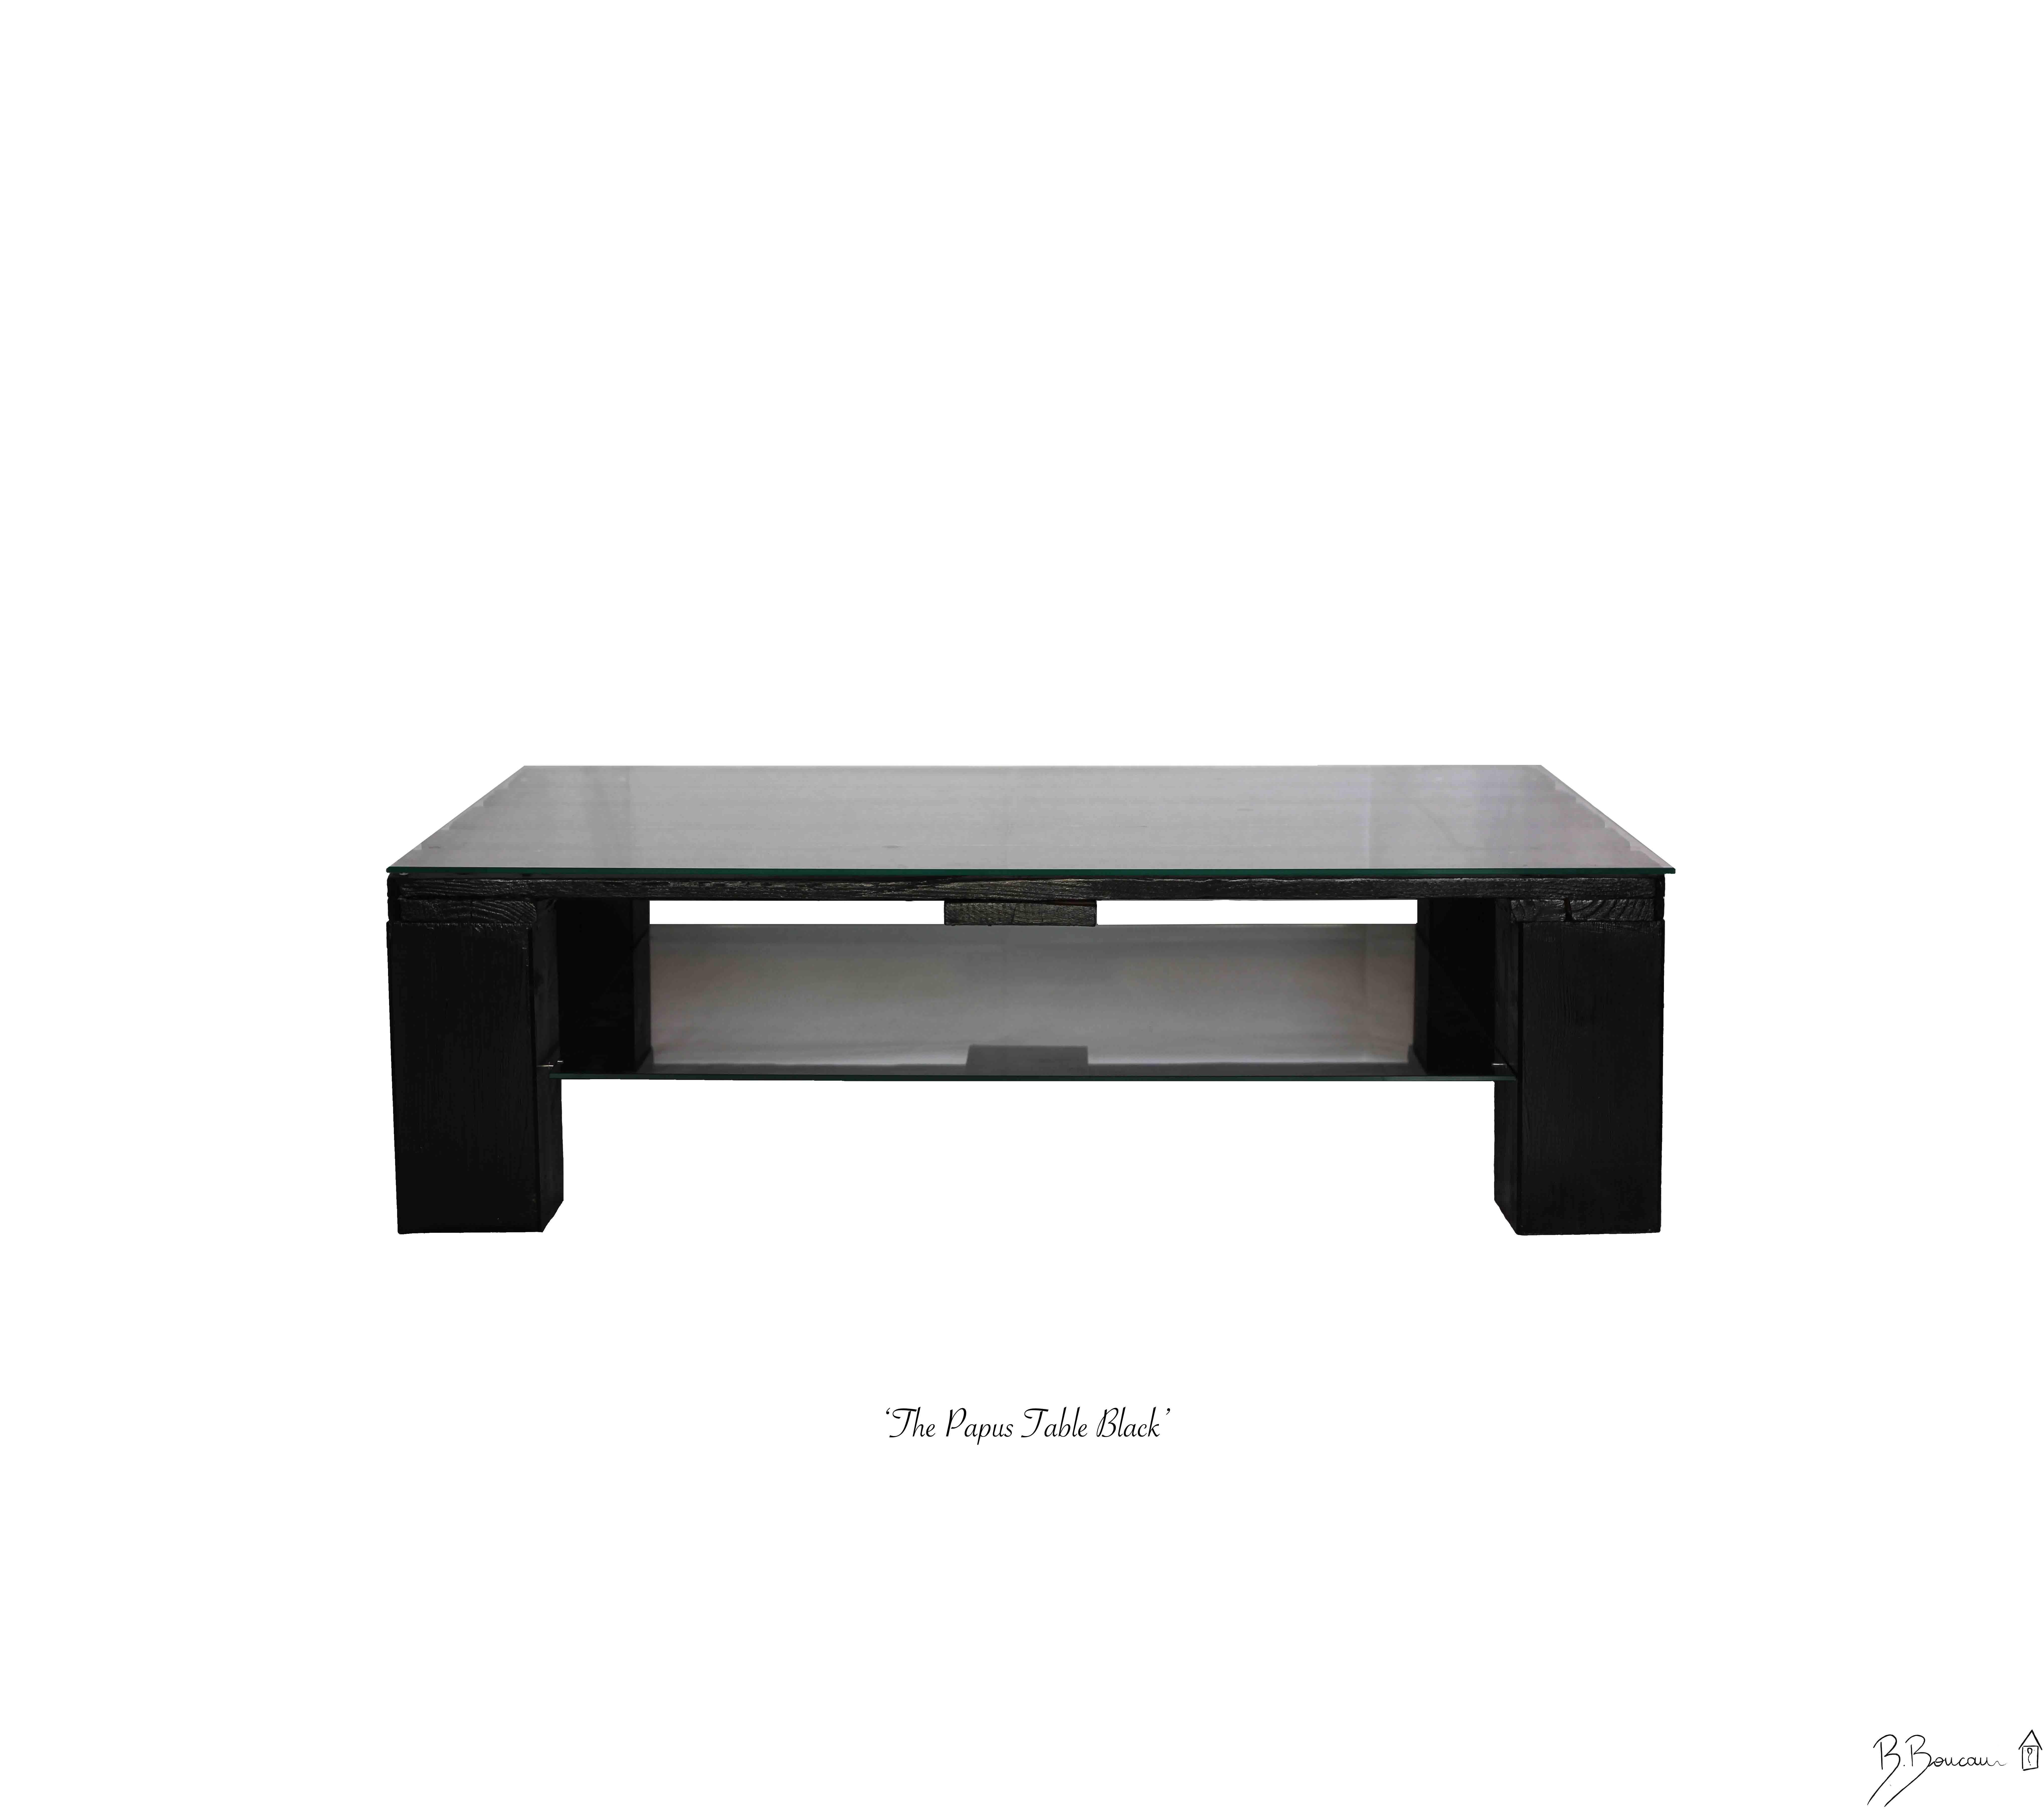 The Papus Table Black copie.jpg